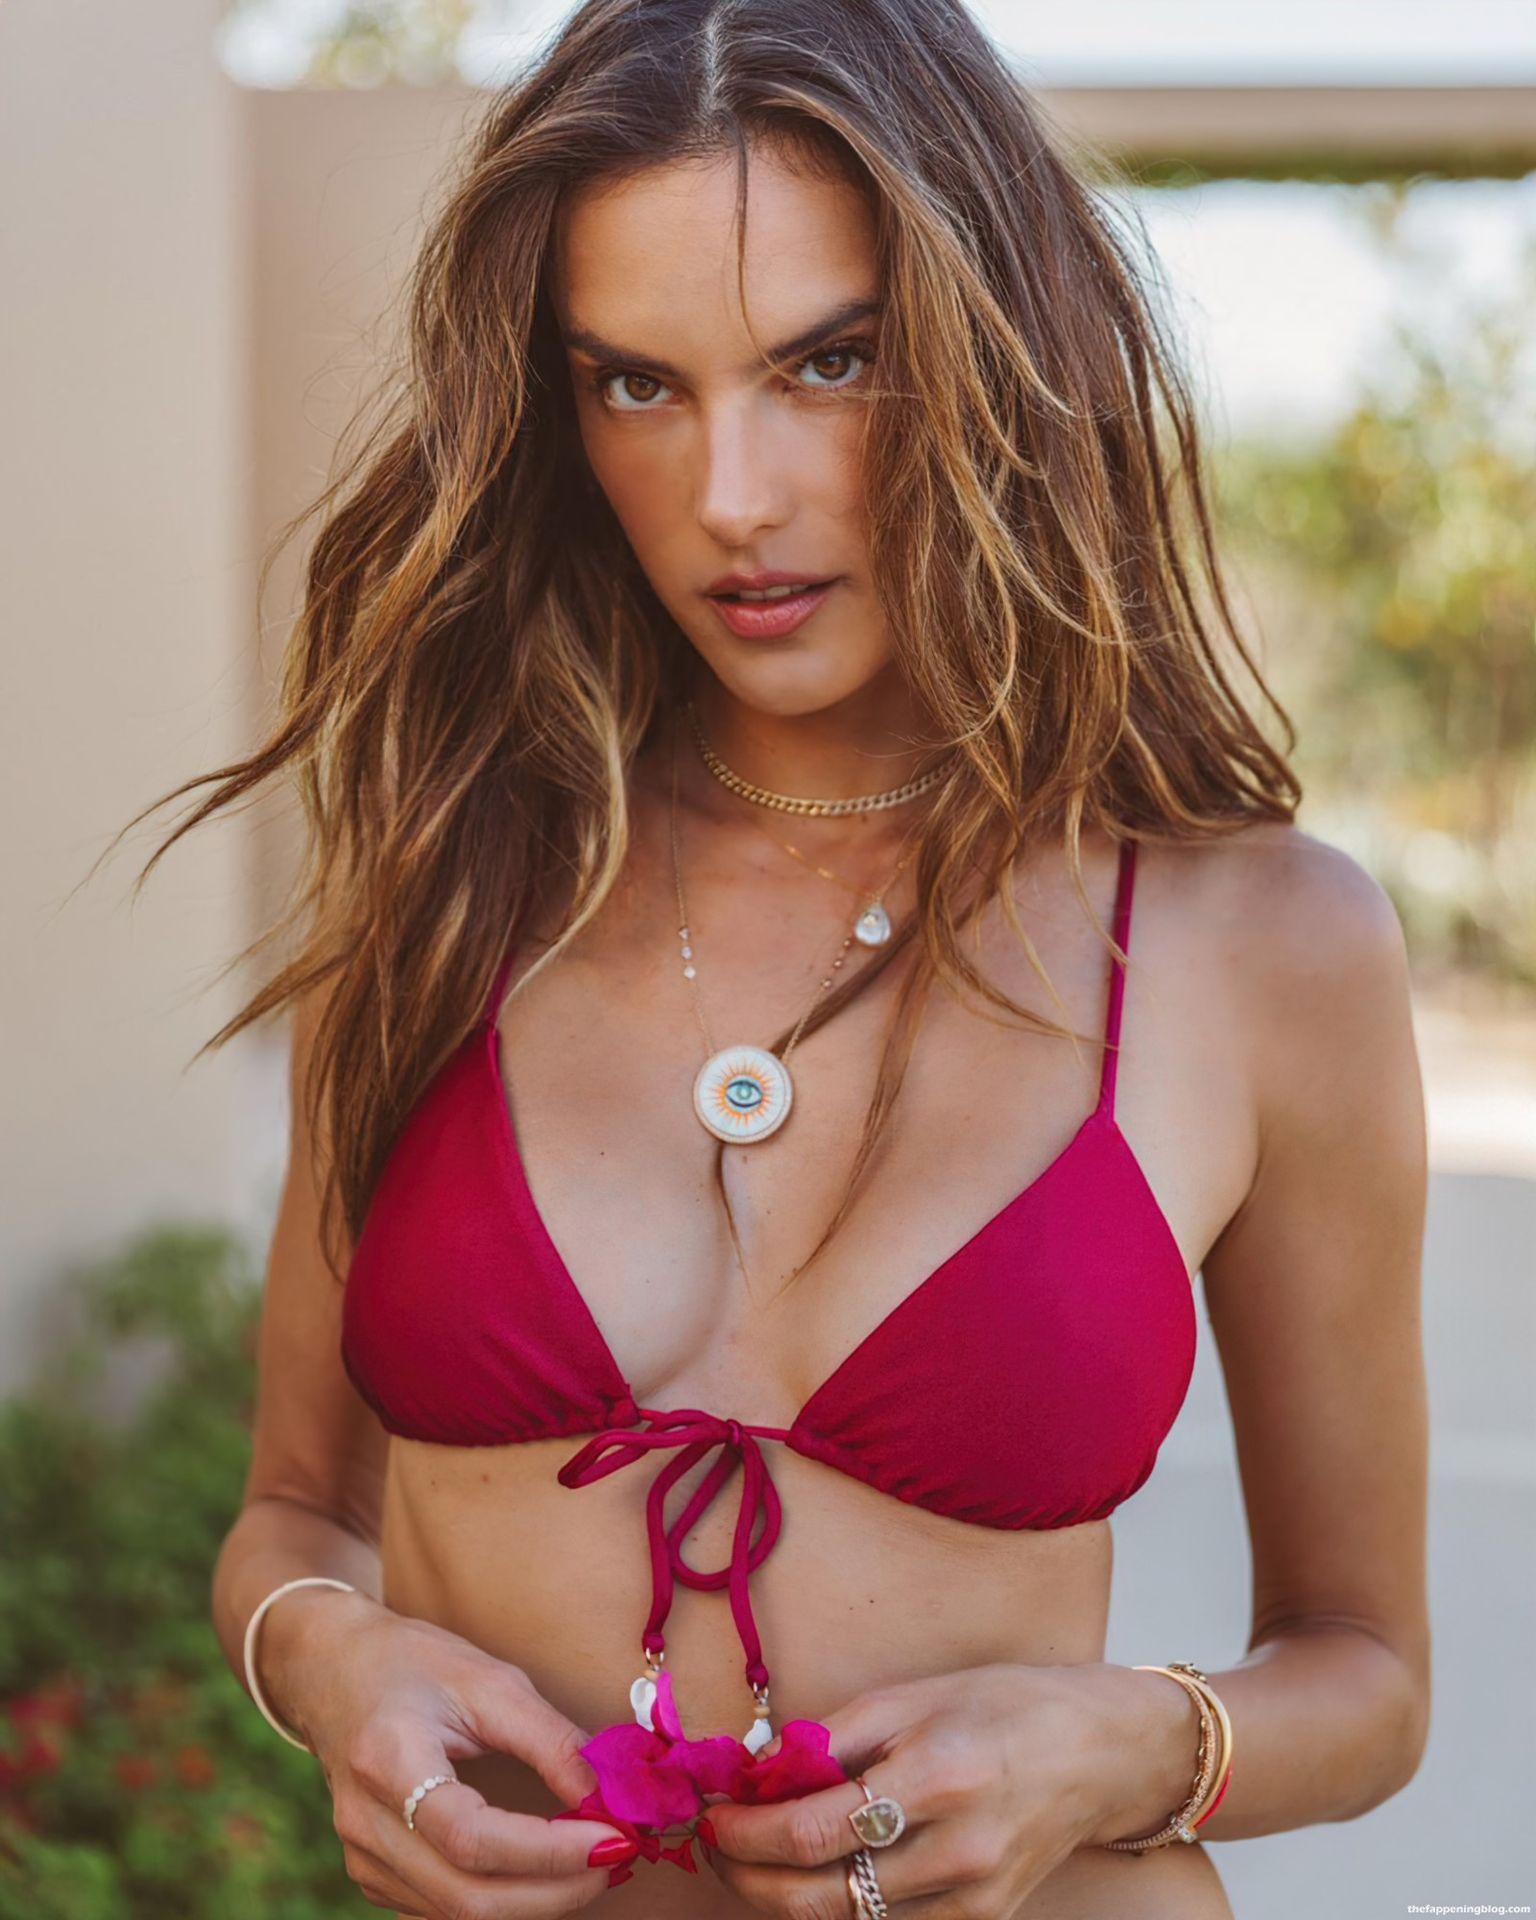 Alessandra-Ambrosio-Sexy-Bikinis-8-thefappeningblog.com_.jpg